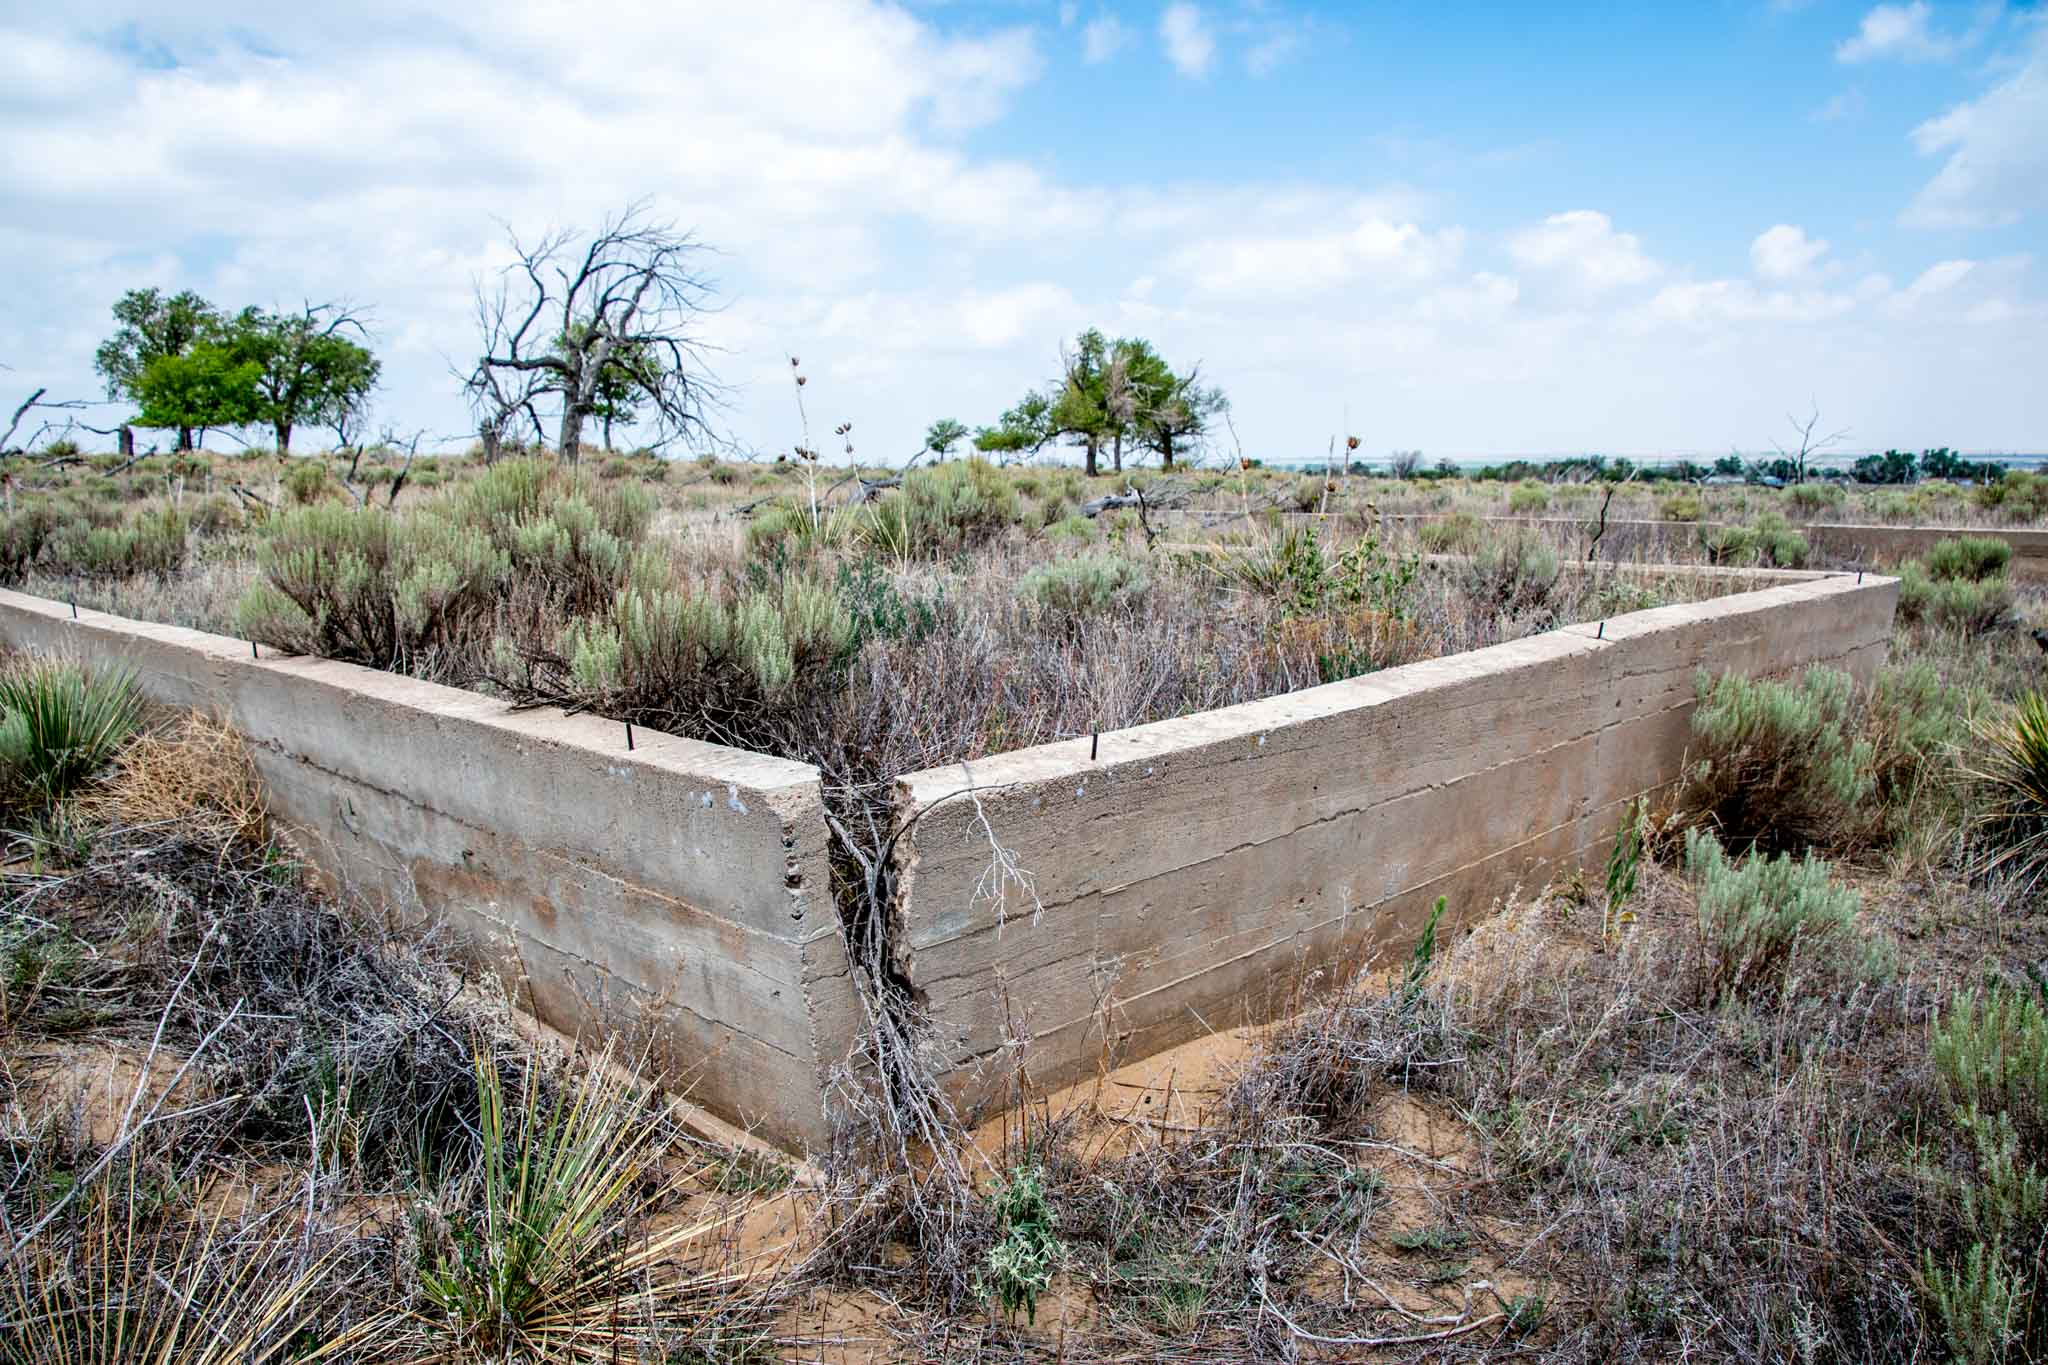 Barracks foundations crumbling